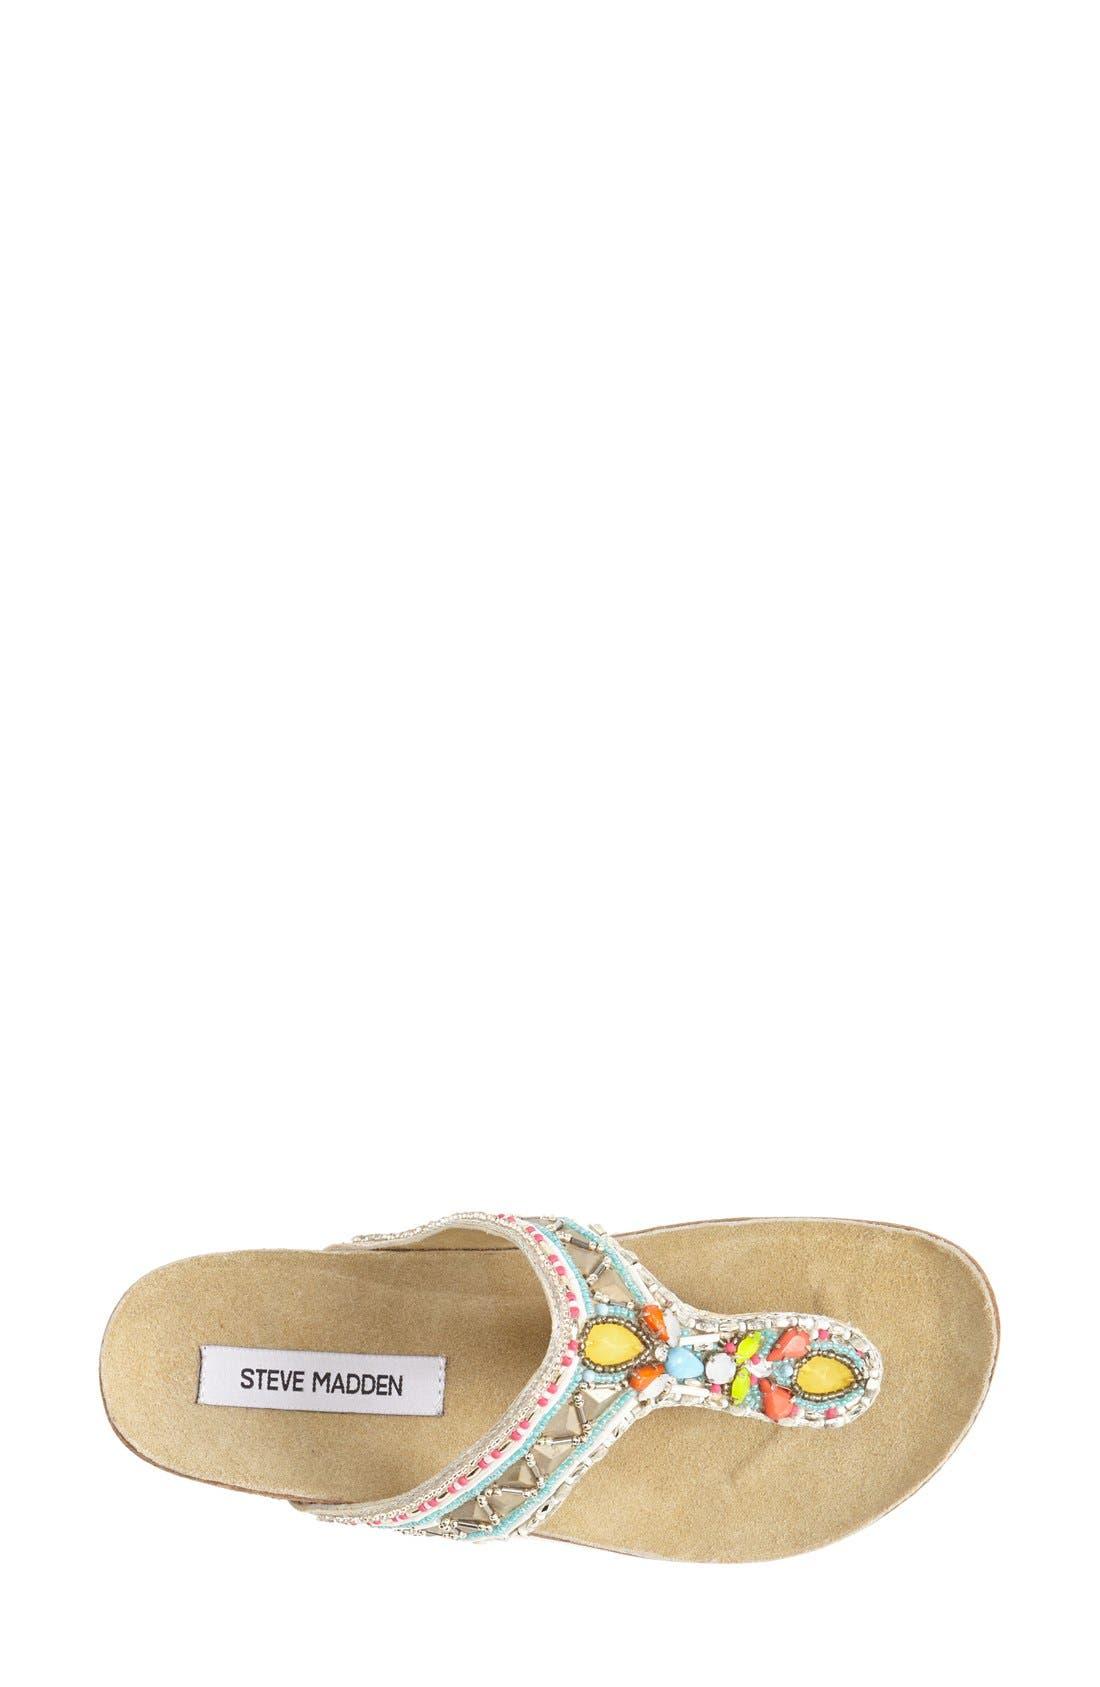 Alternate Image 3  - Steve Madden 'Fiessta' Embellished Thong Sandal (Women)